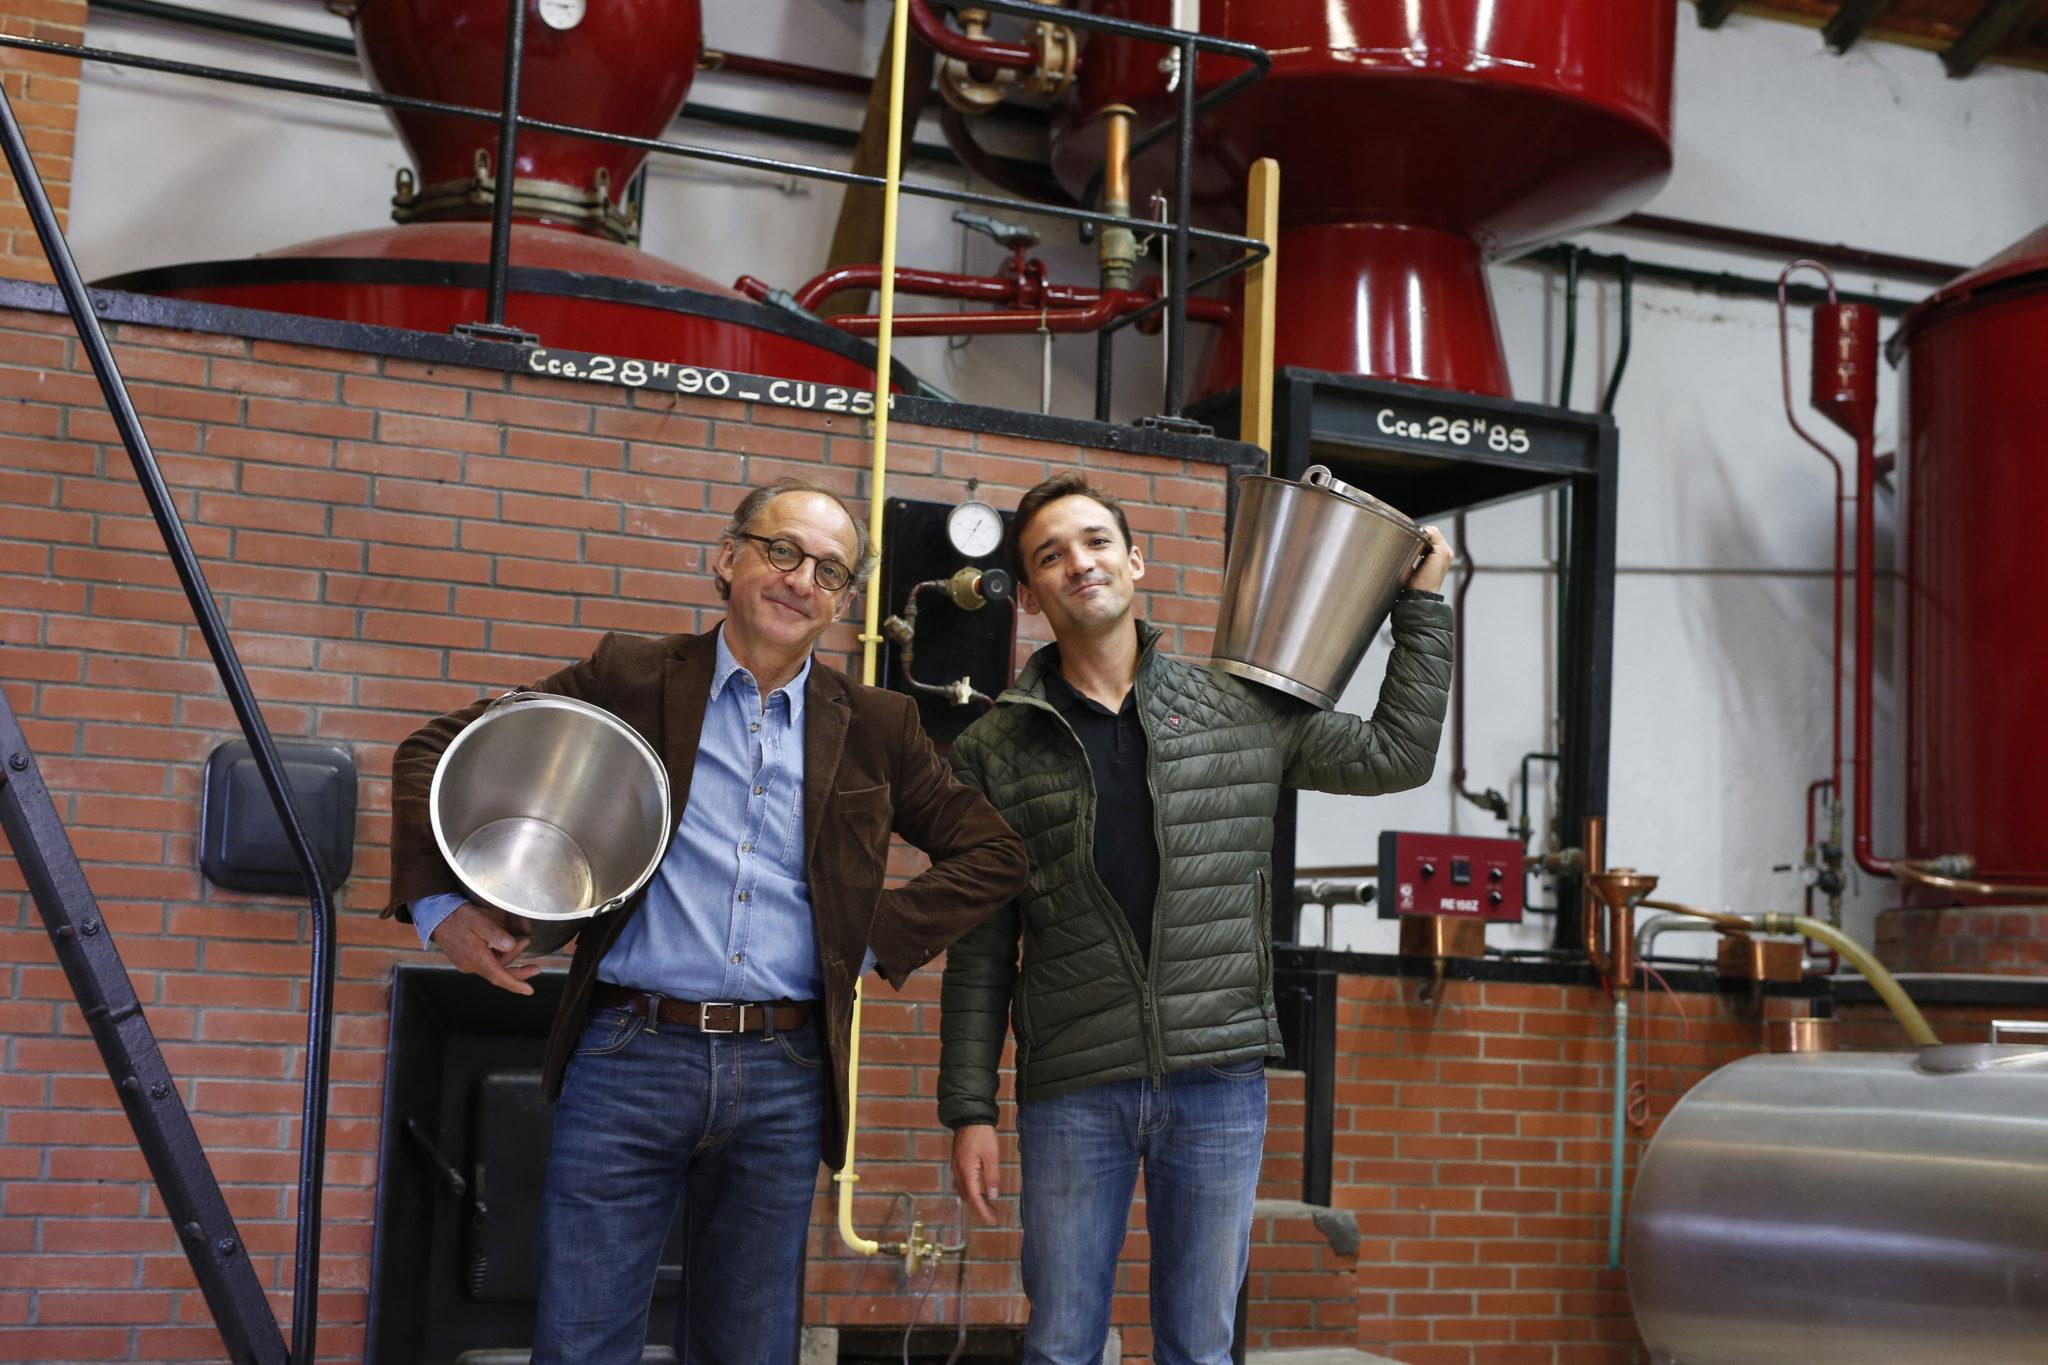 Famille Naud Jean Michel Naud distillerie cachee